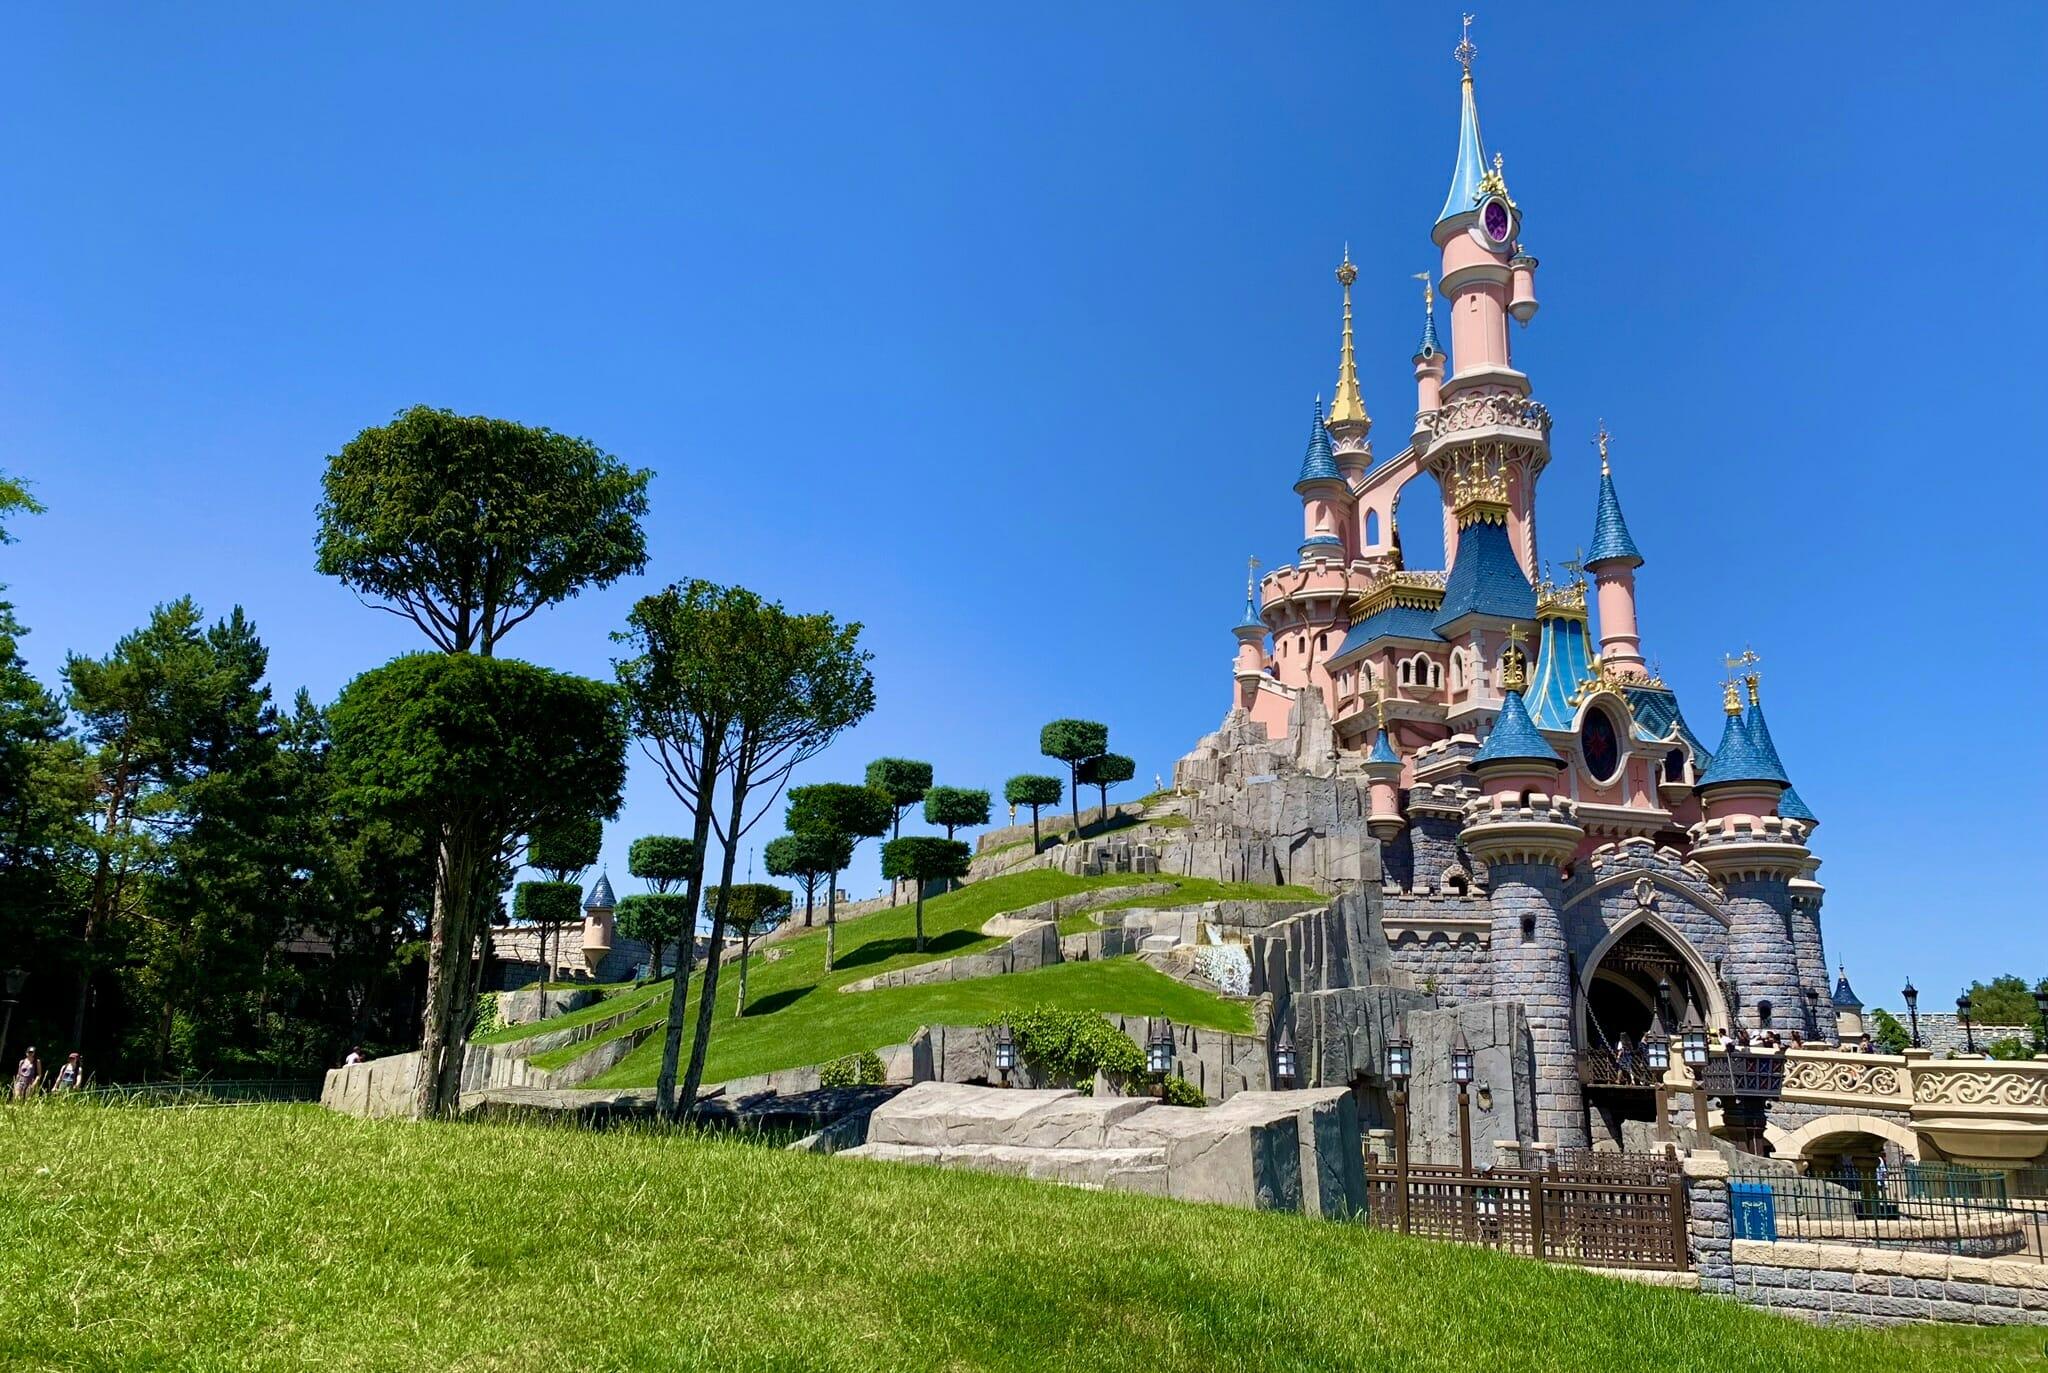 Disneyland Paris 101